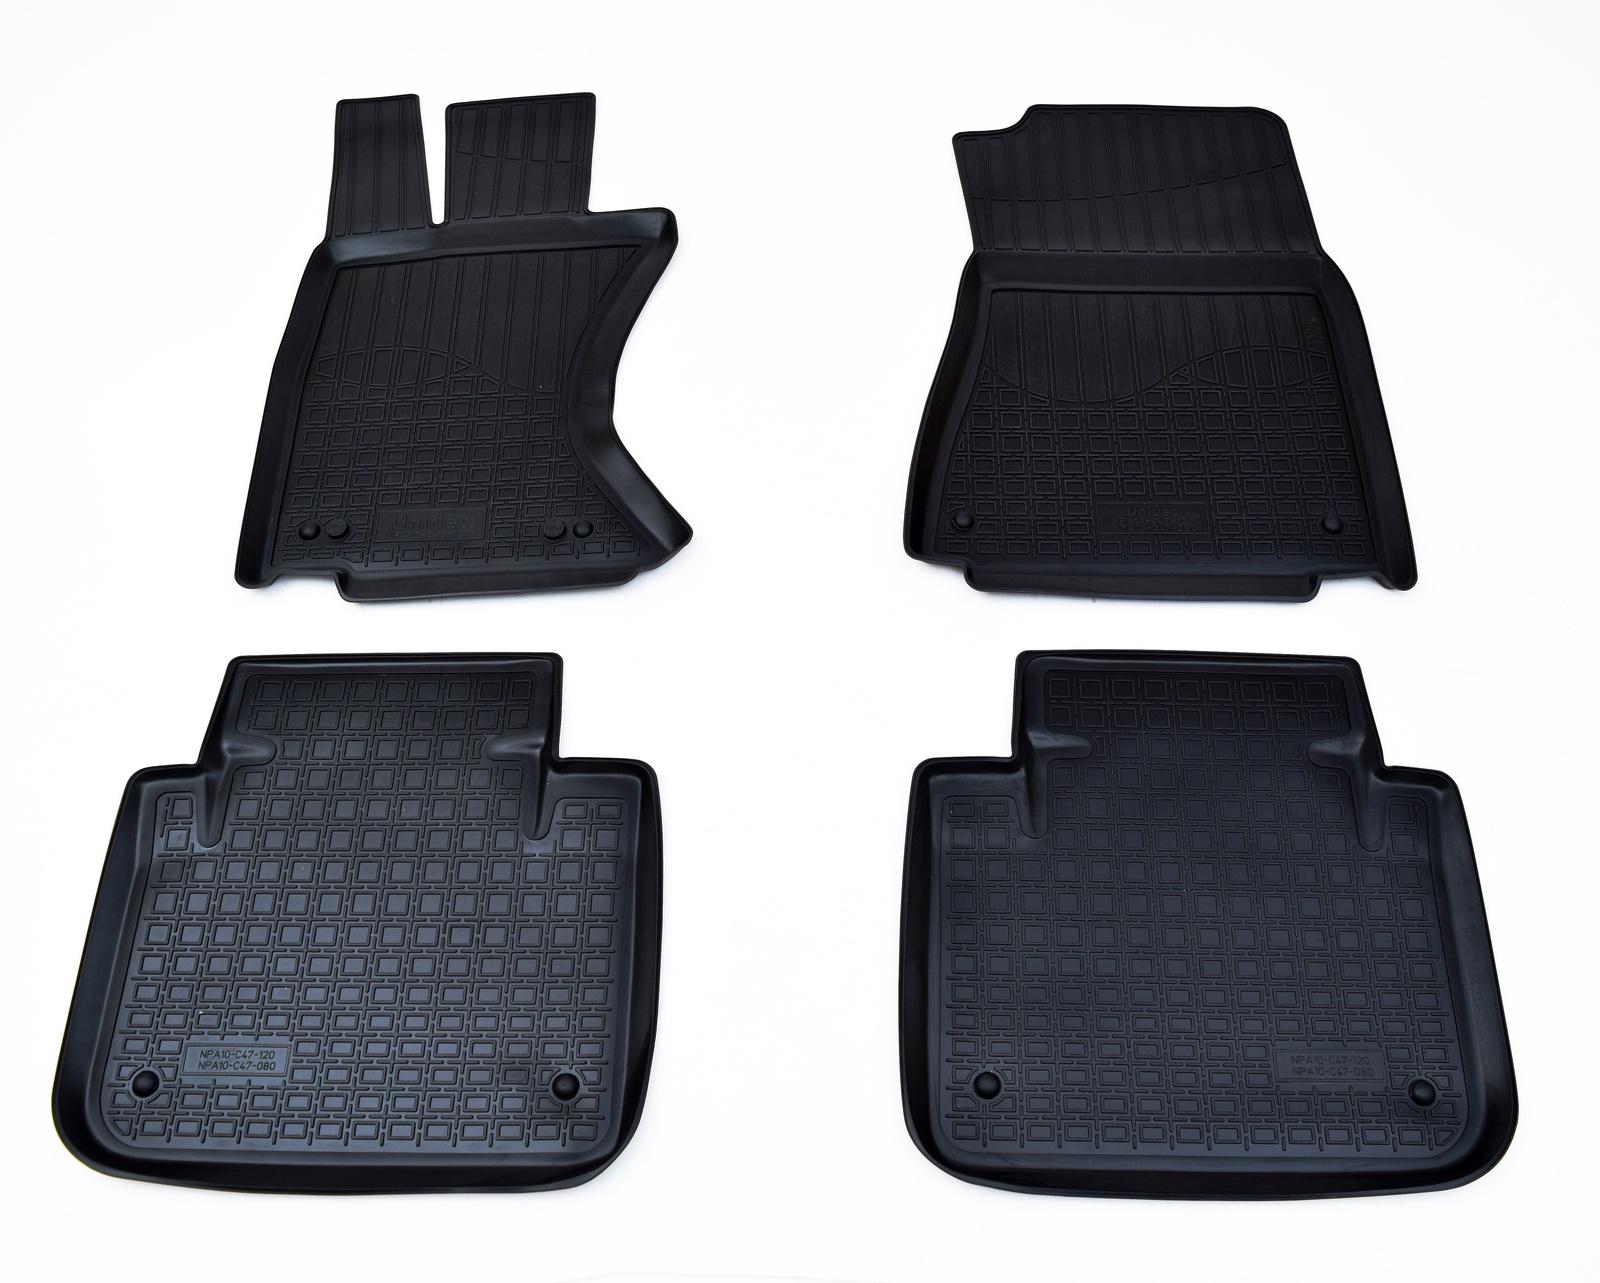 Коврики в салон автомобиля Norplast для Lexus GS AWD (L10A) (2012), NPA10-C47-120, черный цена